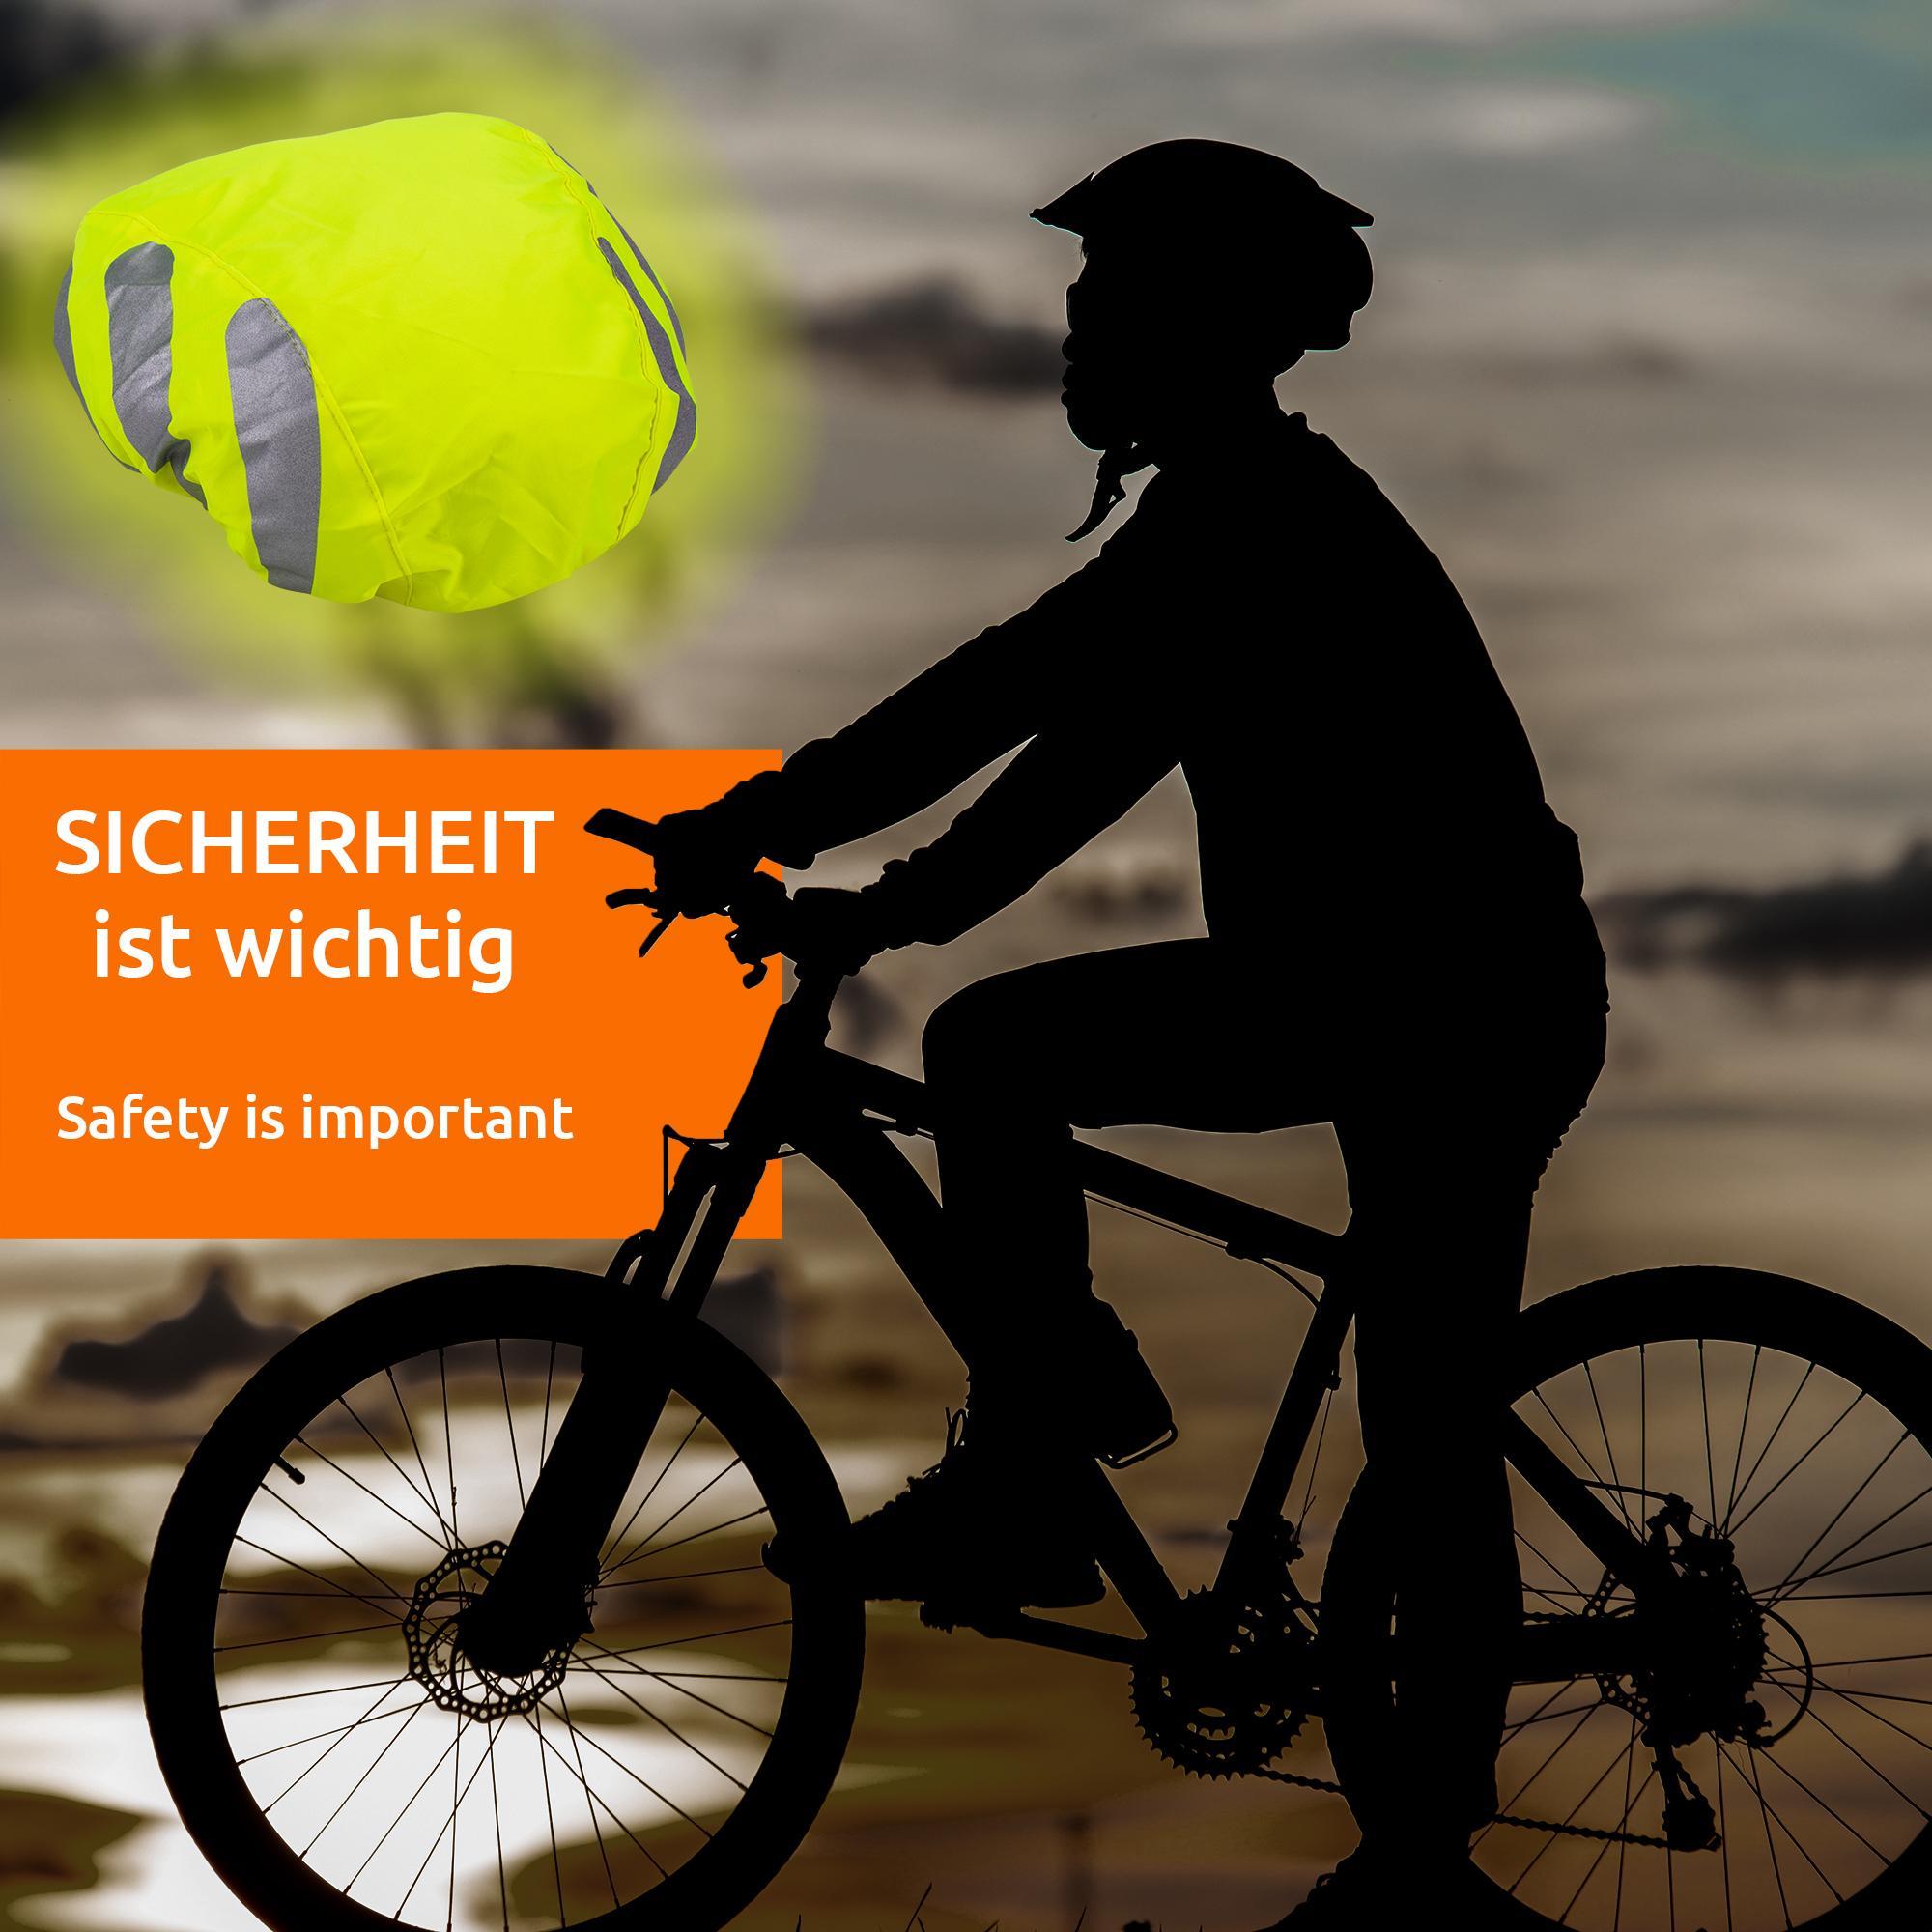 CL86 Selbstklebende Chrom Zierleiste Kantenschutz 8 METER Lang 6mm Breit